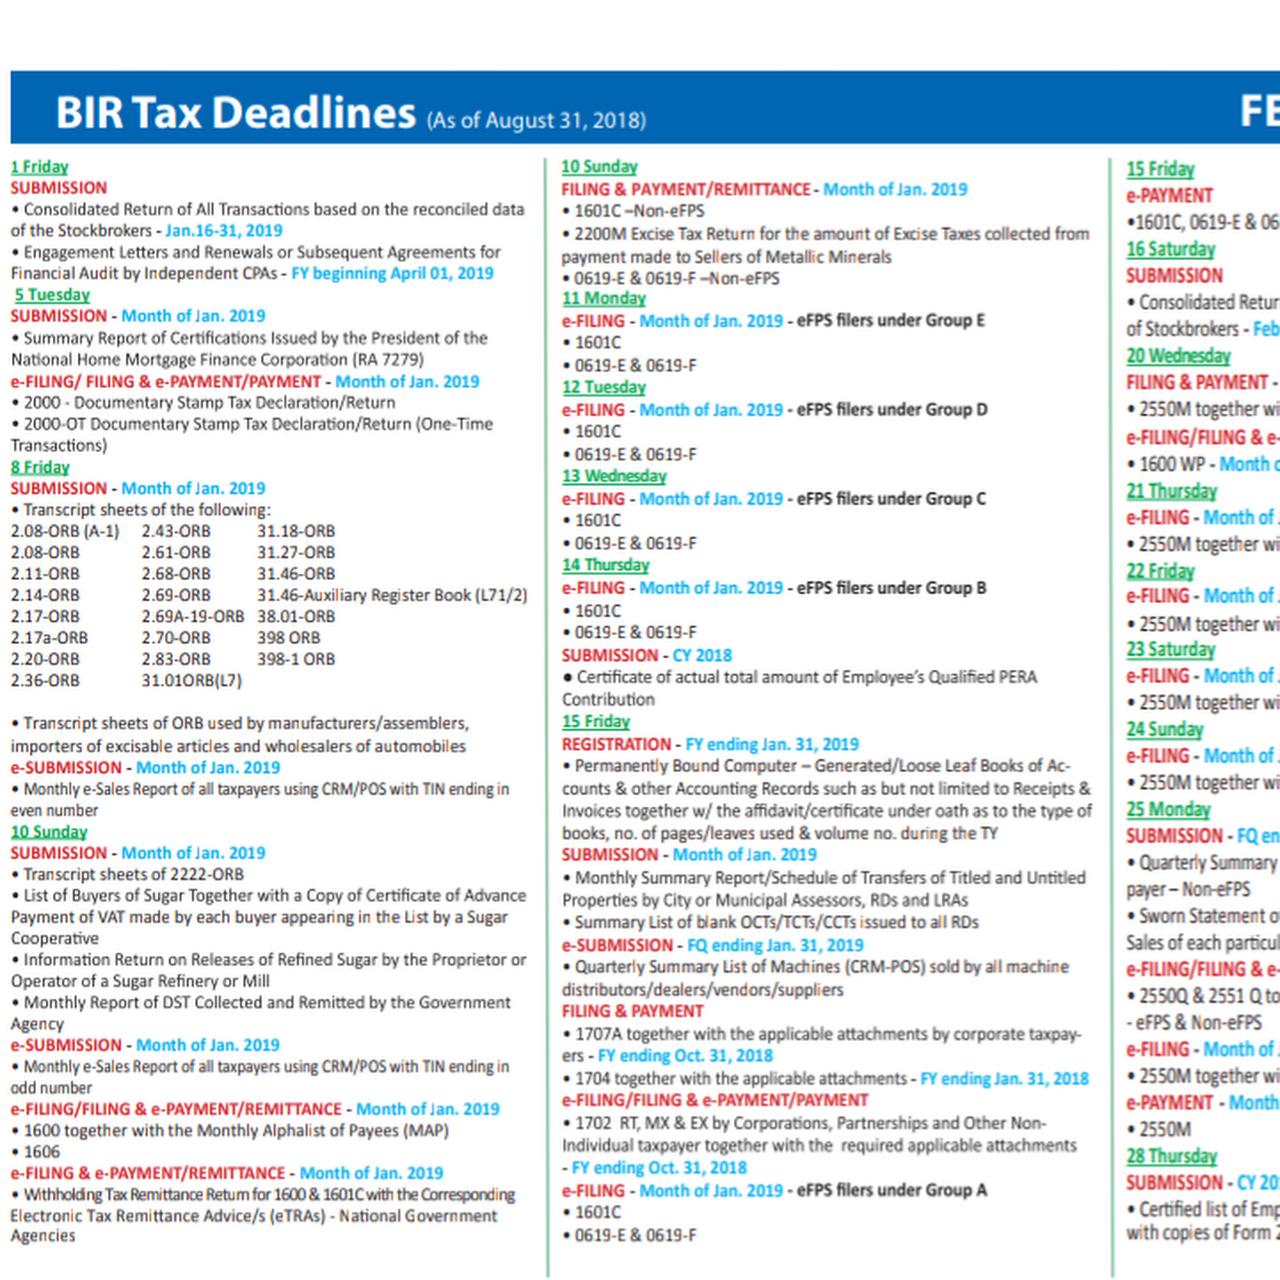 Quarterly Alphalist Of Payees Deadline